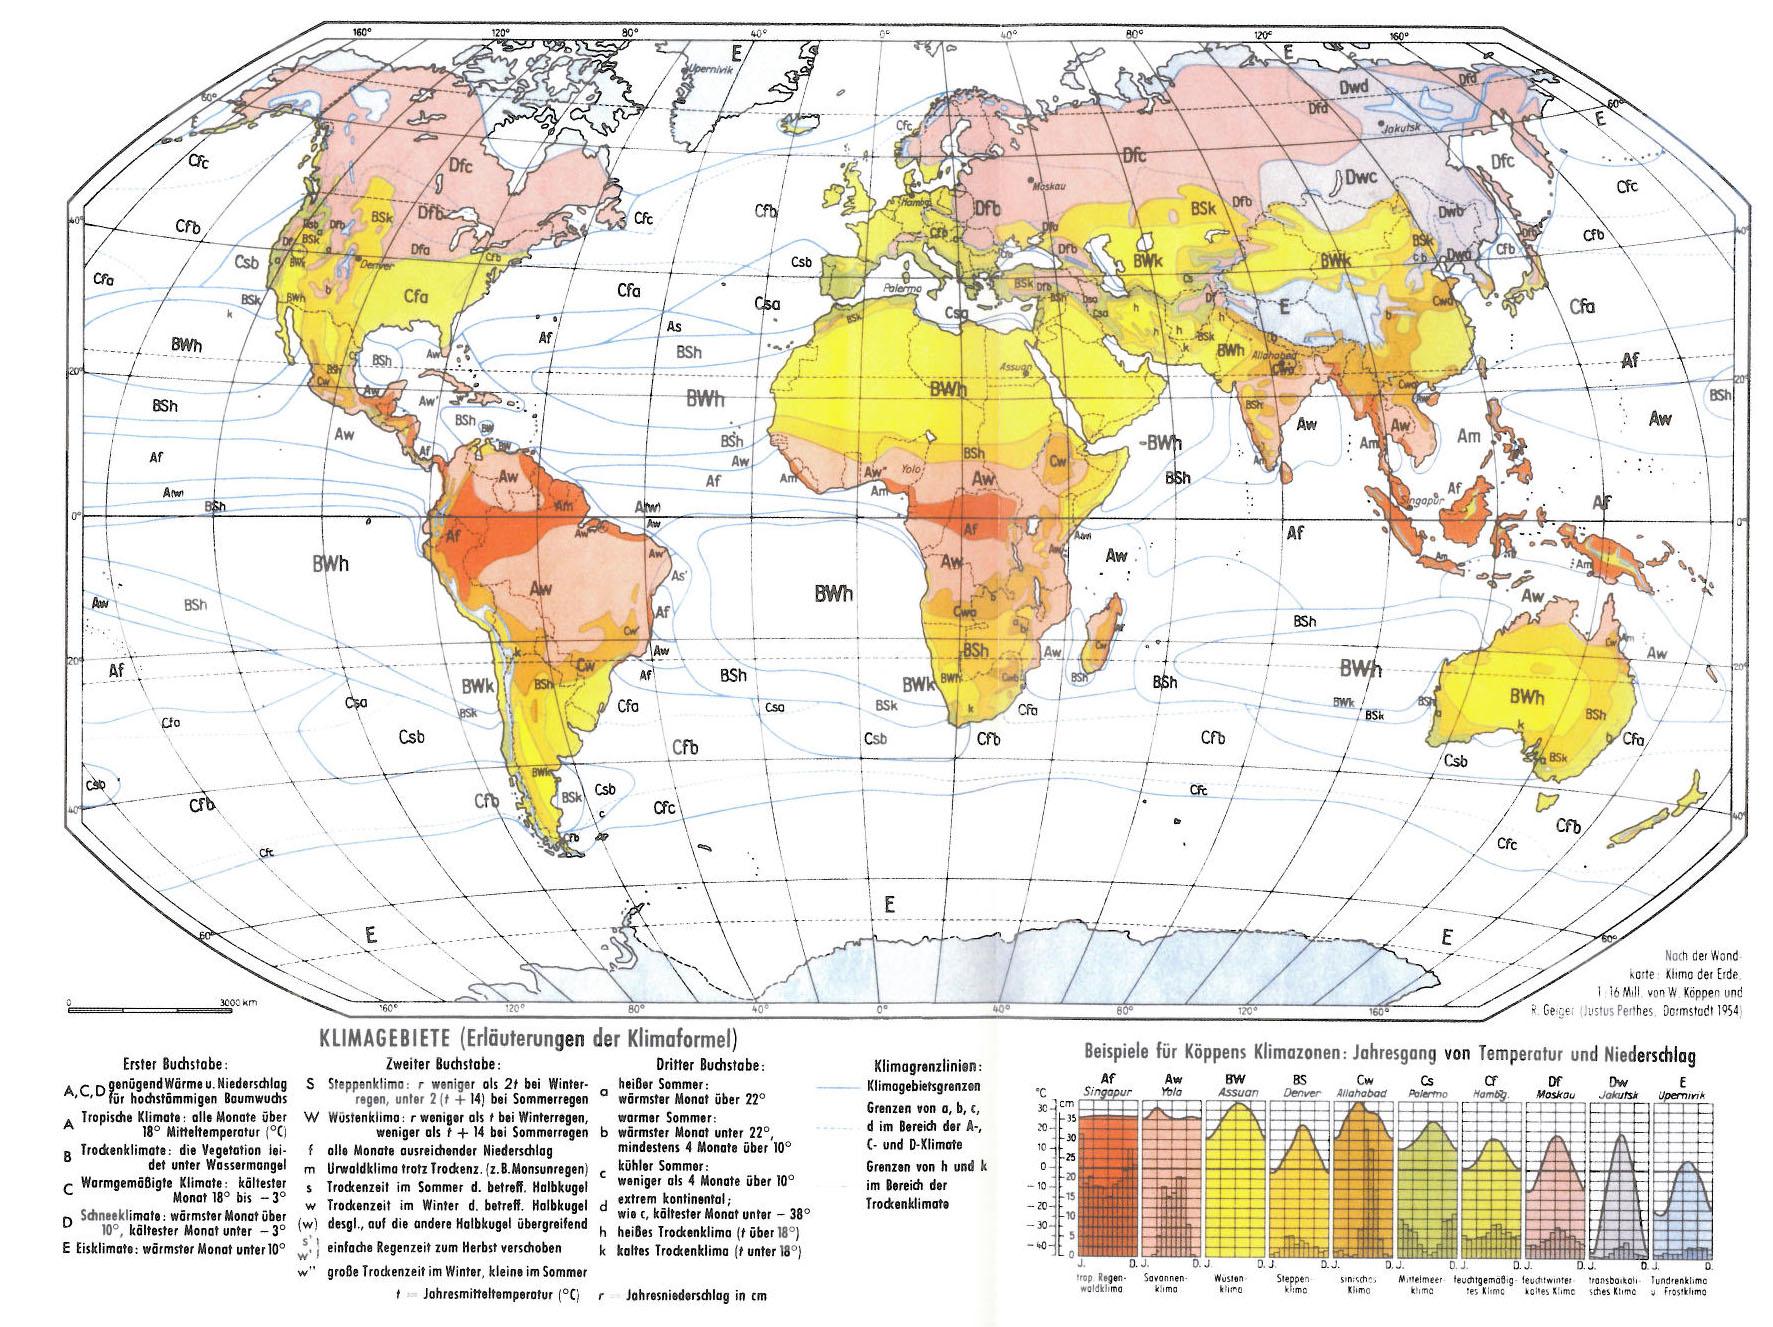 koeppen w und r geiger 1954 klima der erde climate of the earth wall map 1 16 mill klett perthes gotha map